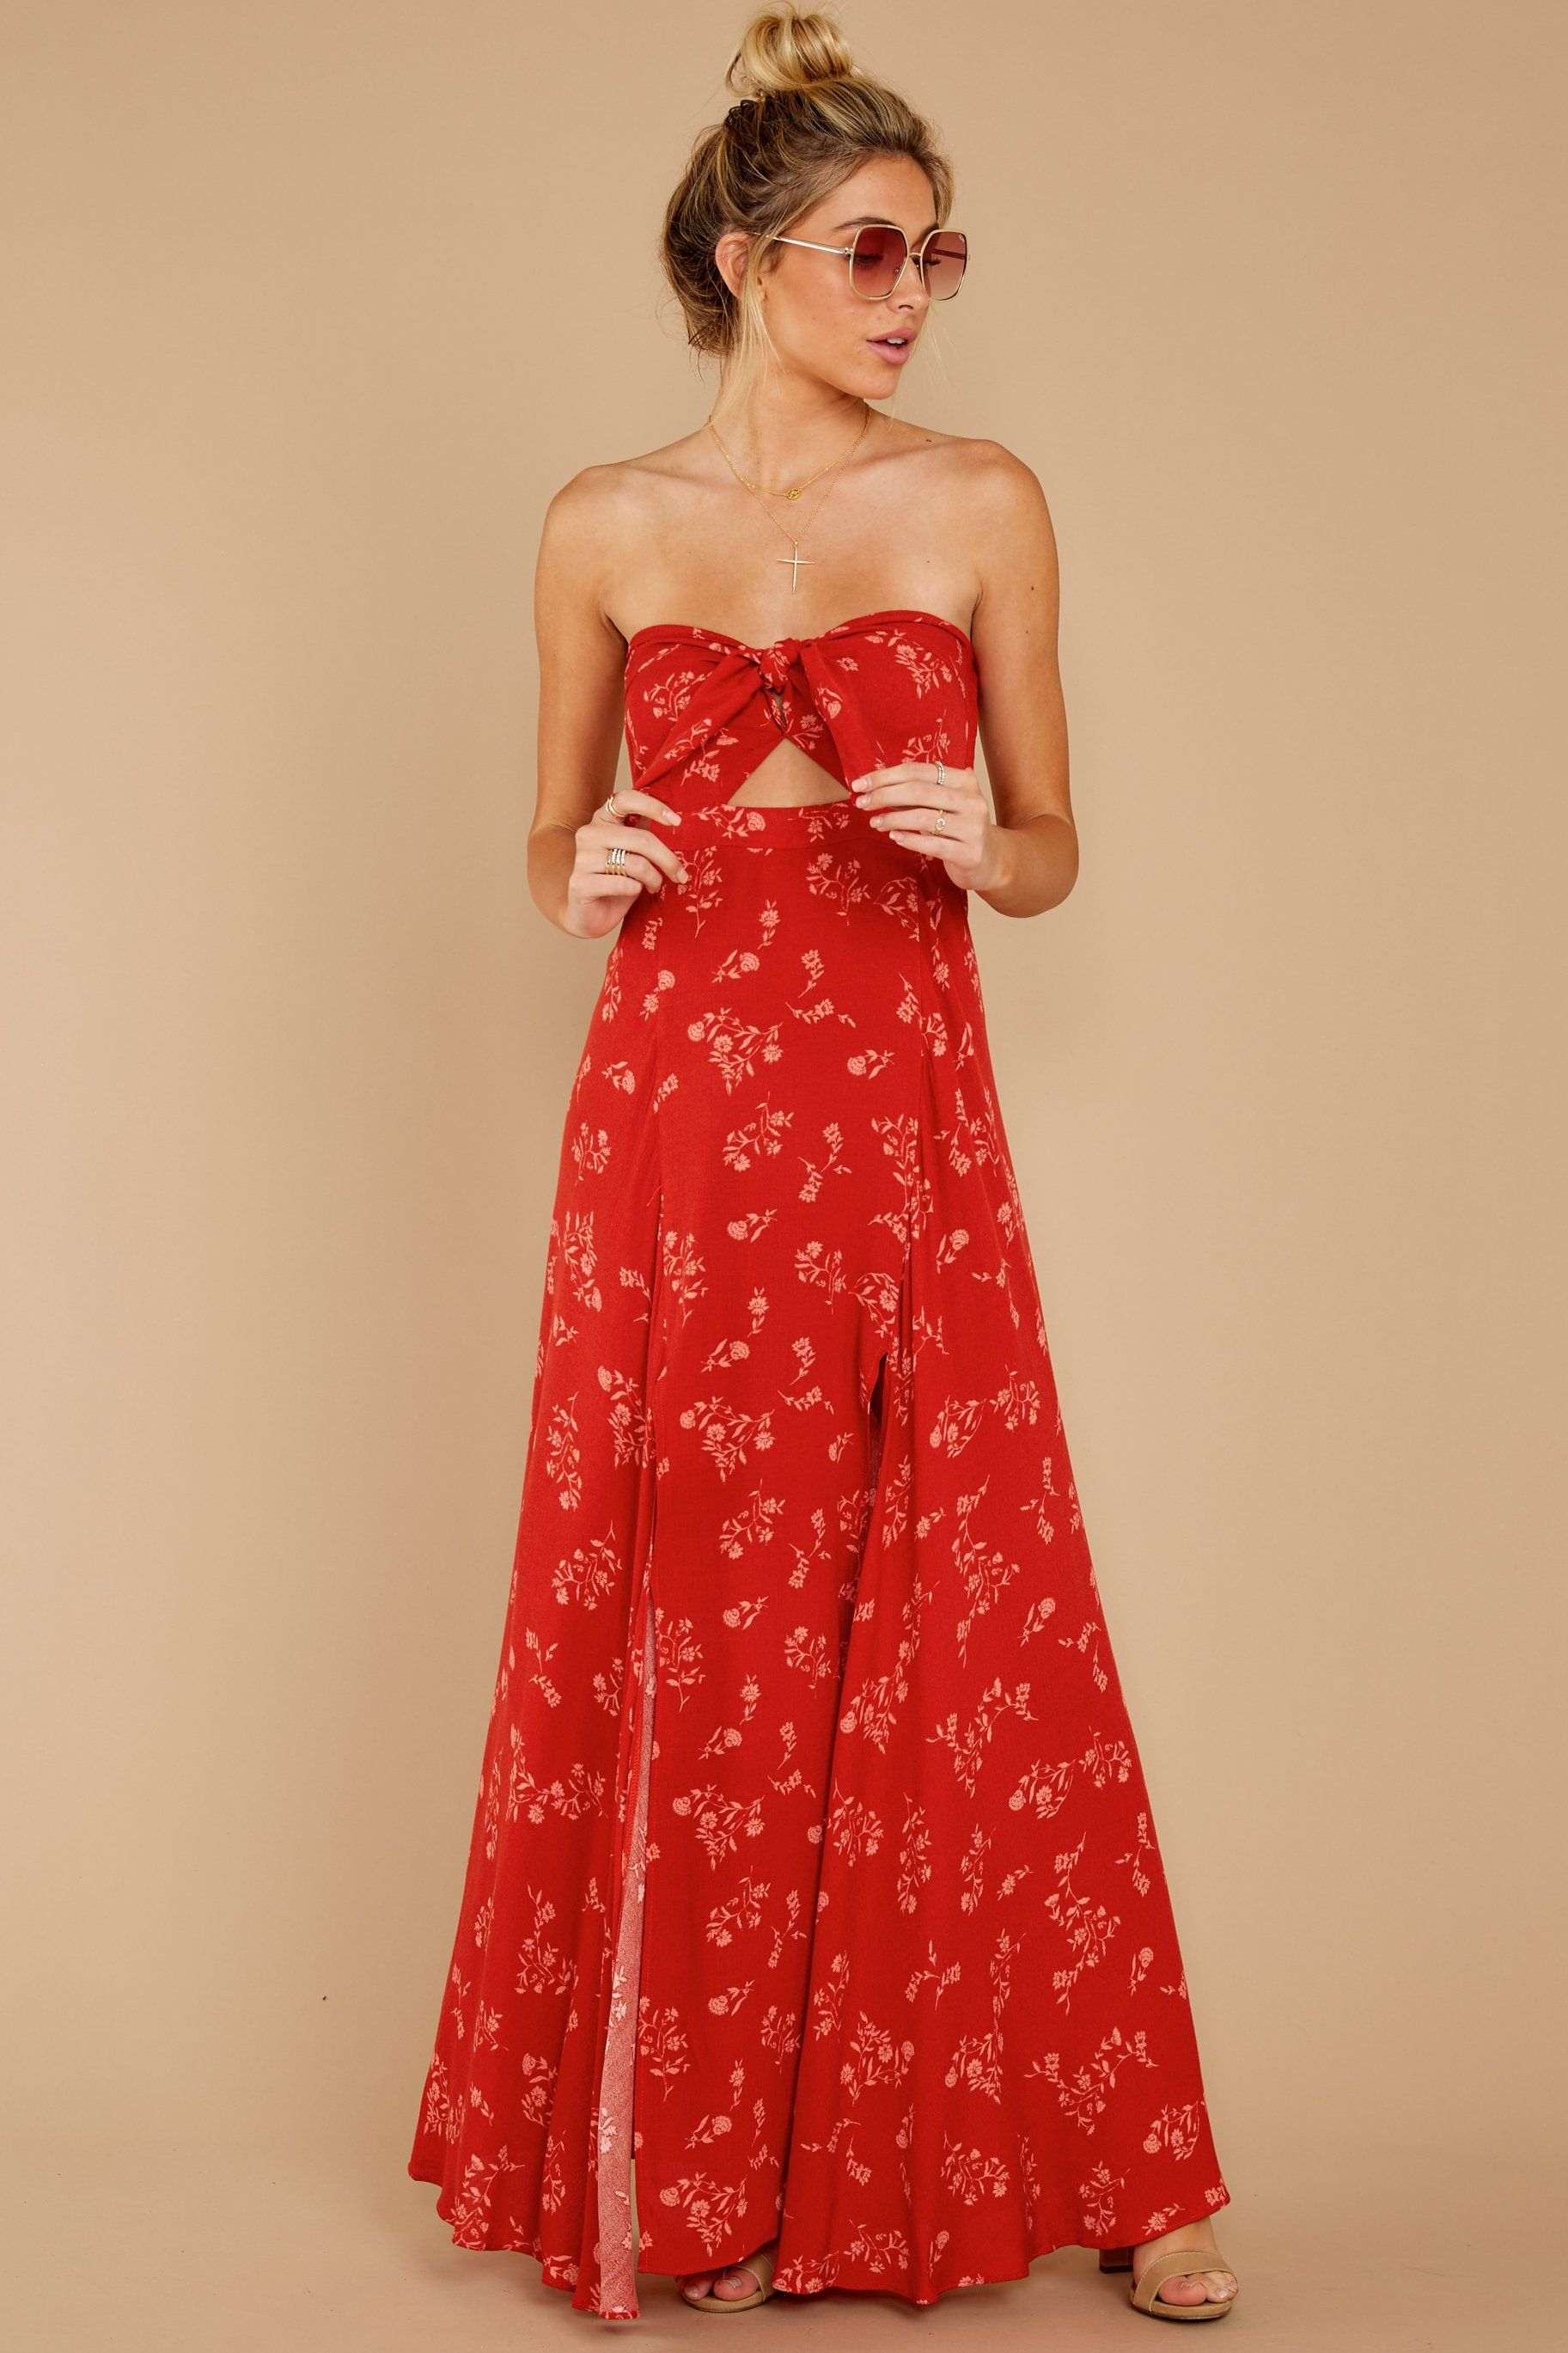 Stunning Rust Dress Strapless Floral Print Dress Dress 60 00 Red Dress Red Dress Women Strapless Dress Formal Unique Dresses [ 2738 x 1825 Pixel ]